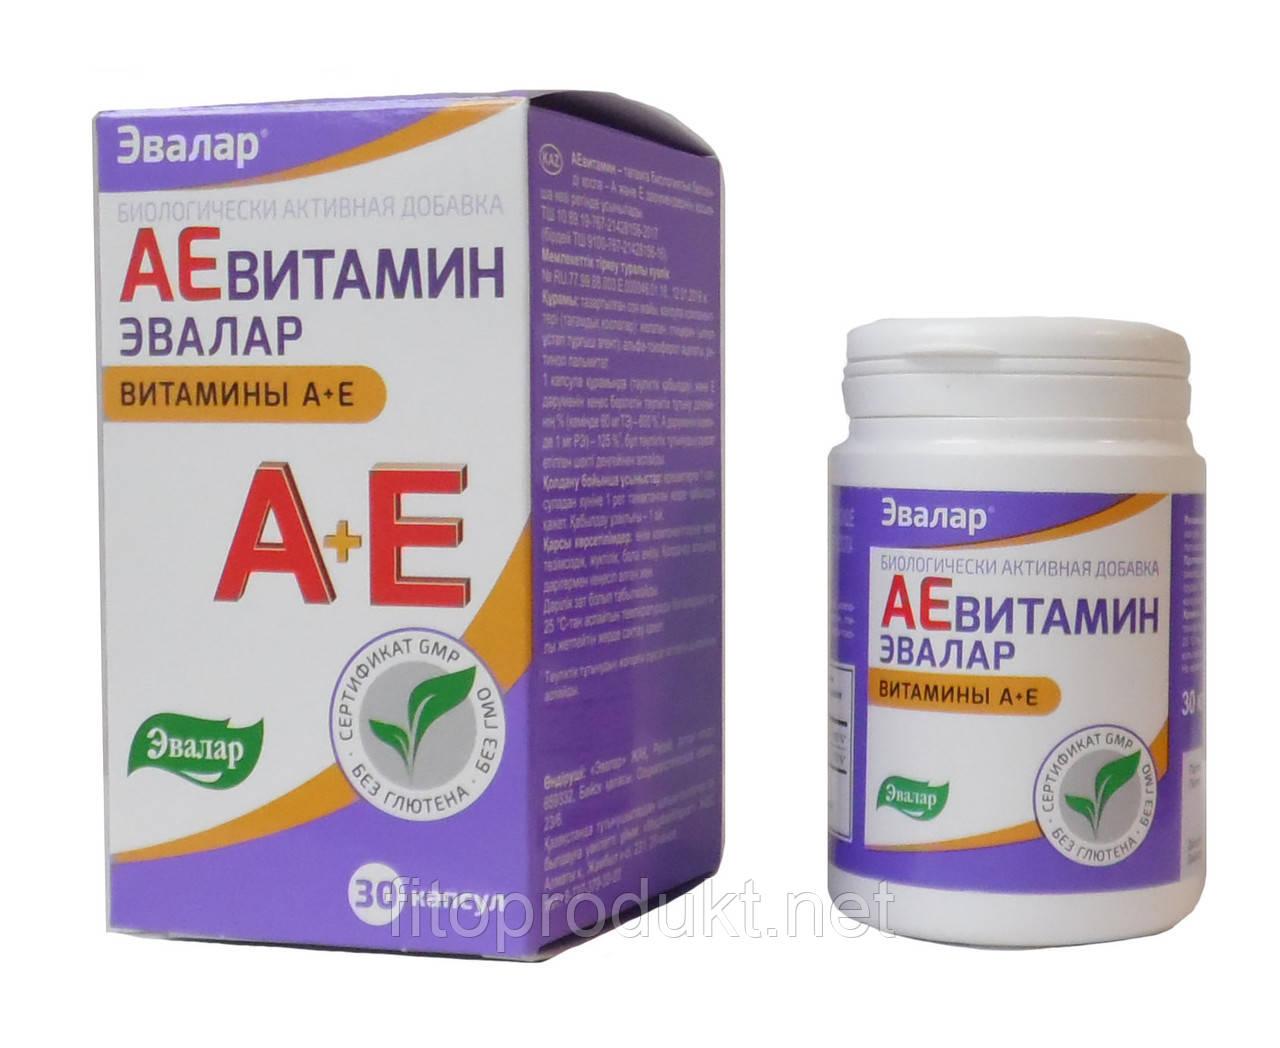 АЕвитамин витамины А+Е, 30 капсул Эвалар